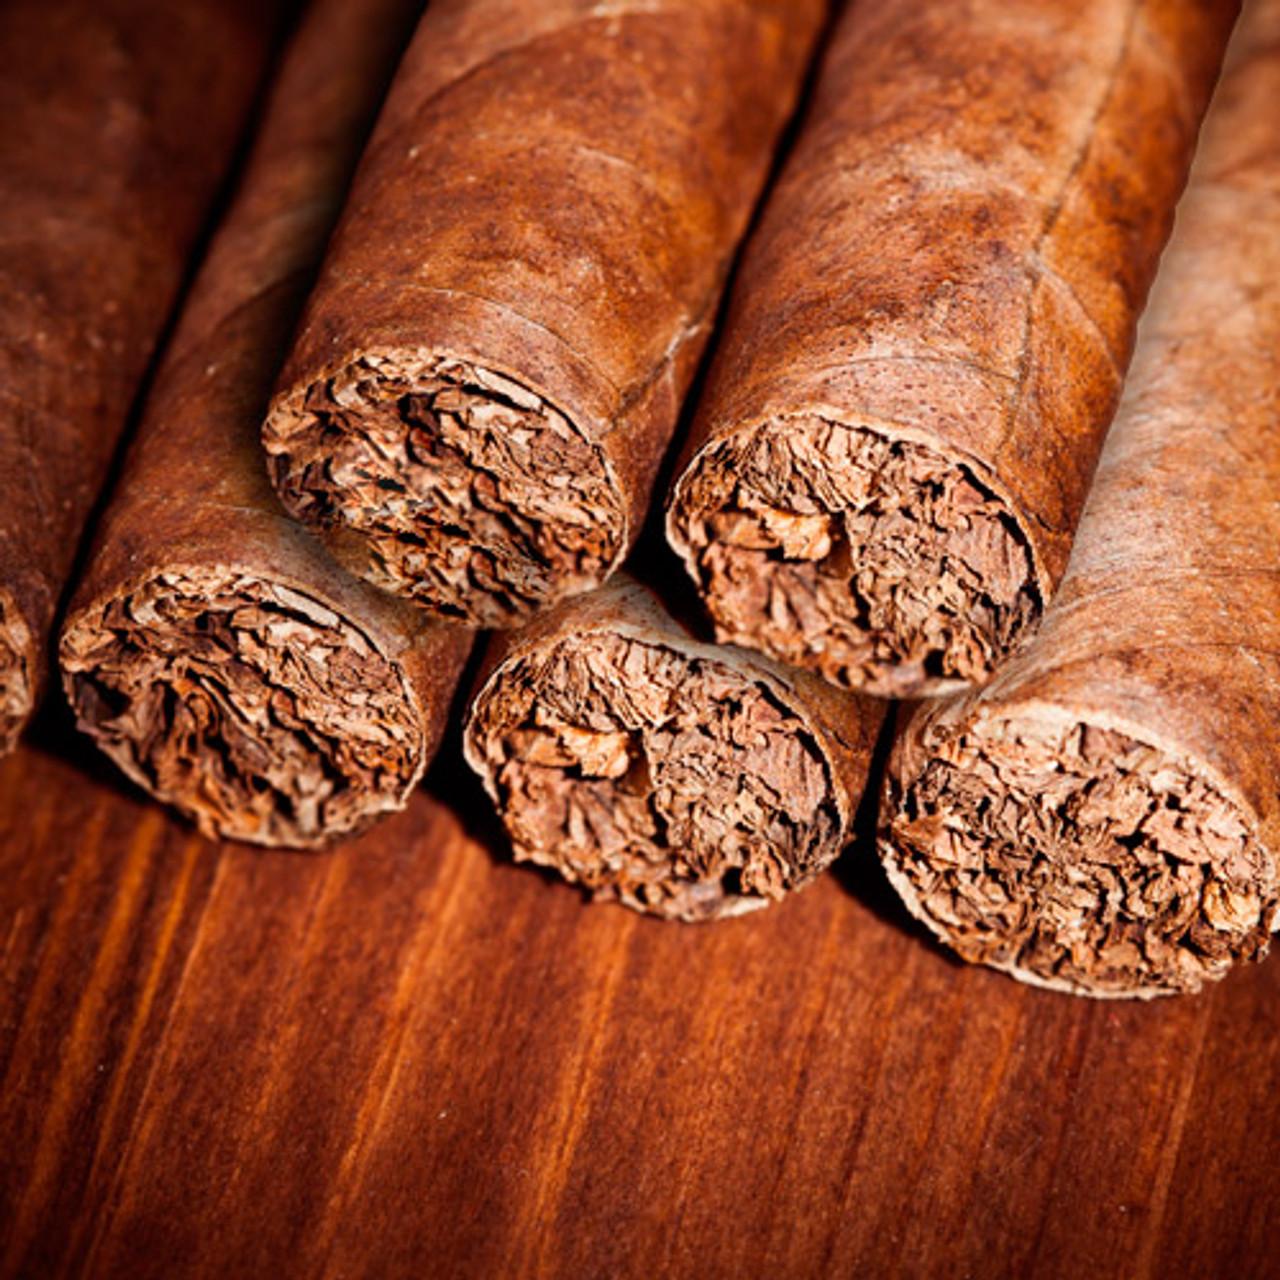 Maria Mancini Magic Mountain Sampler Cigars - 6 x 54 (Box of 8)